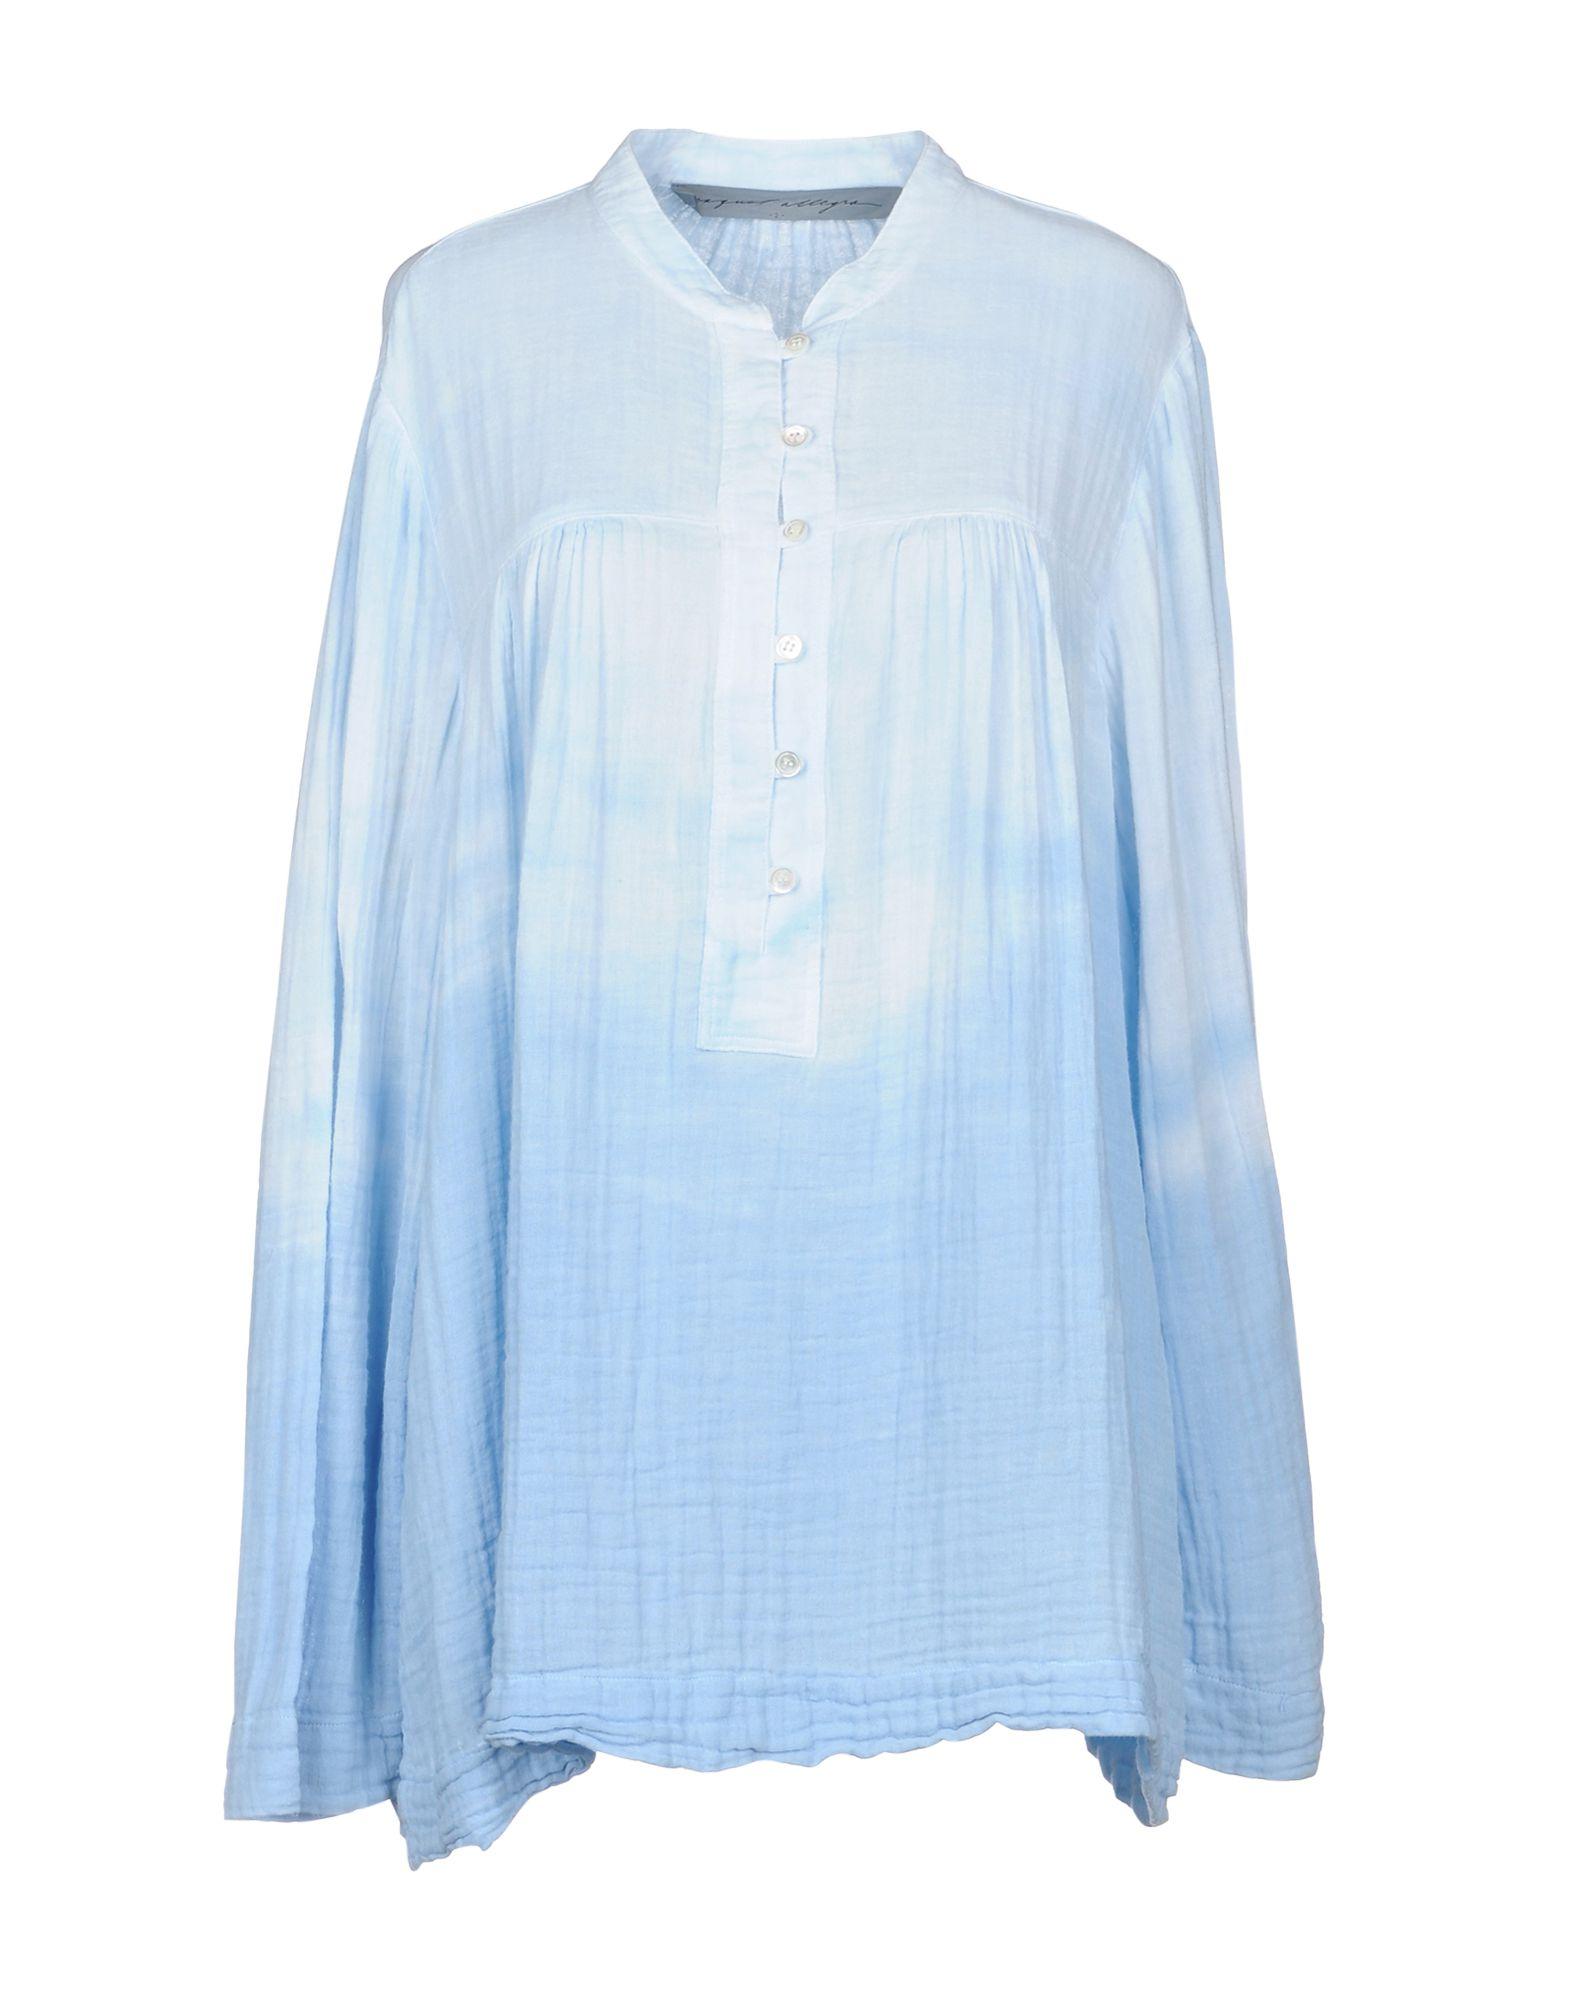 цена на RAQUEL ALLEGRA Блузка